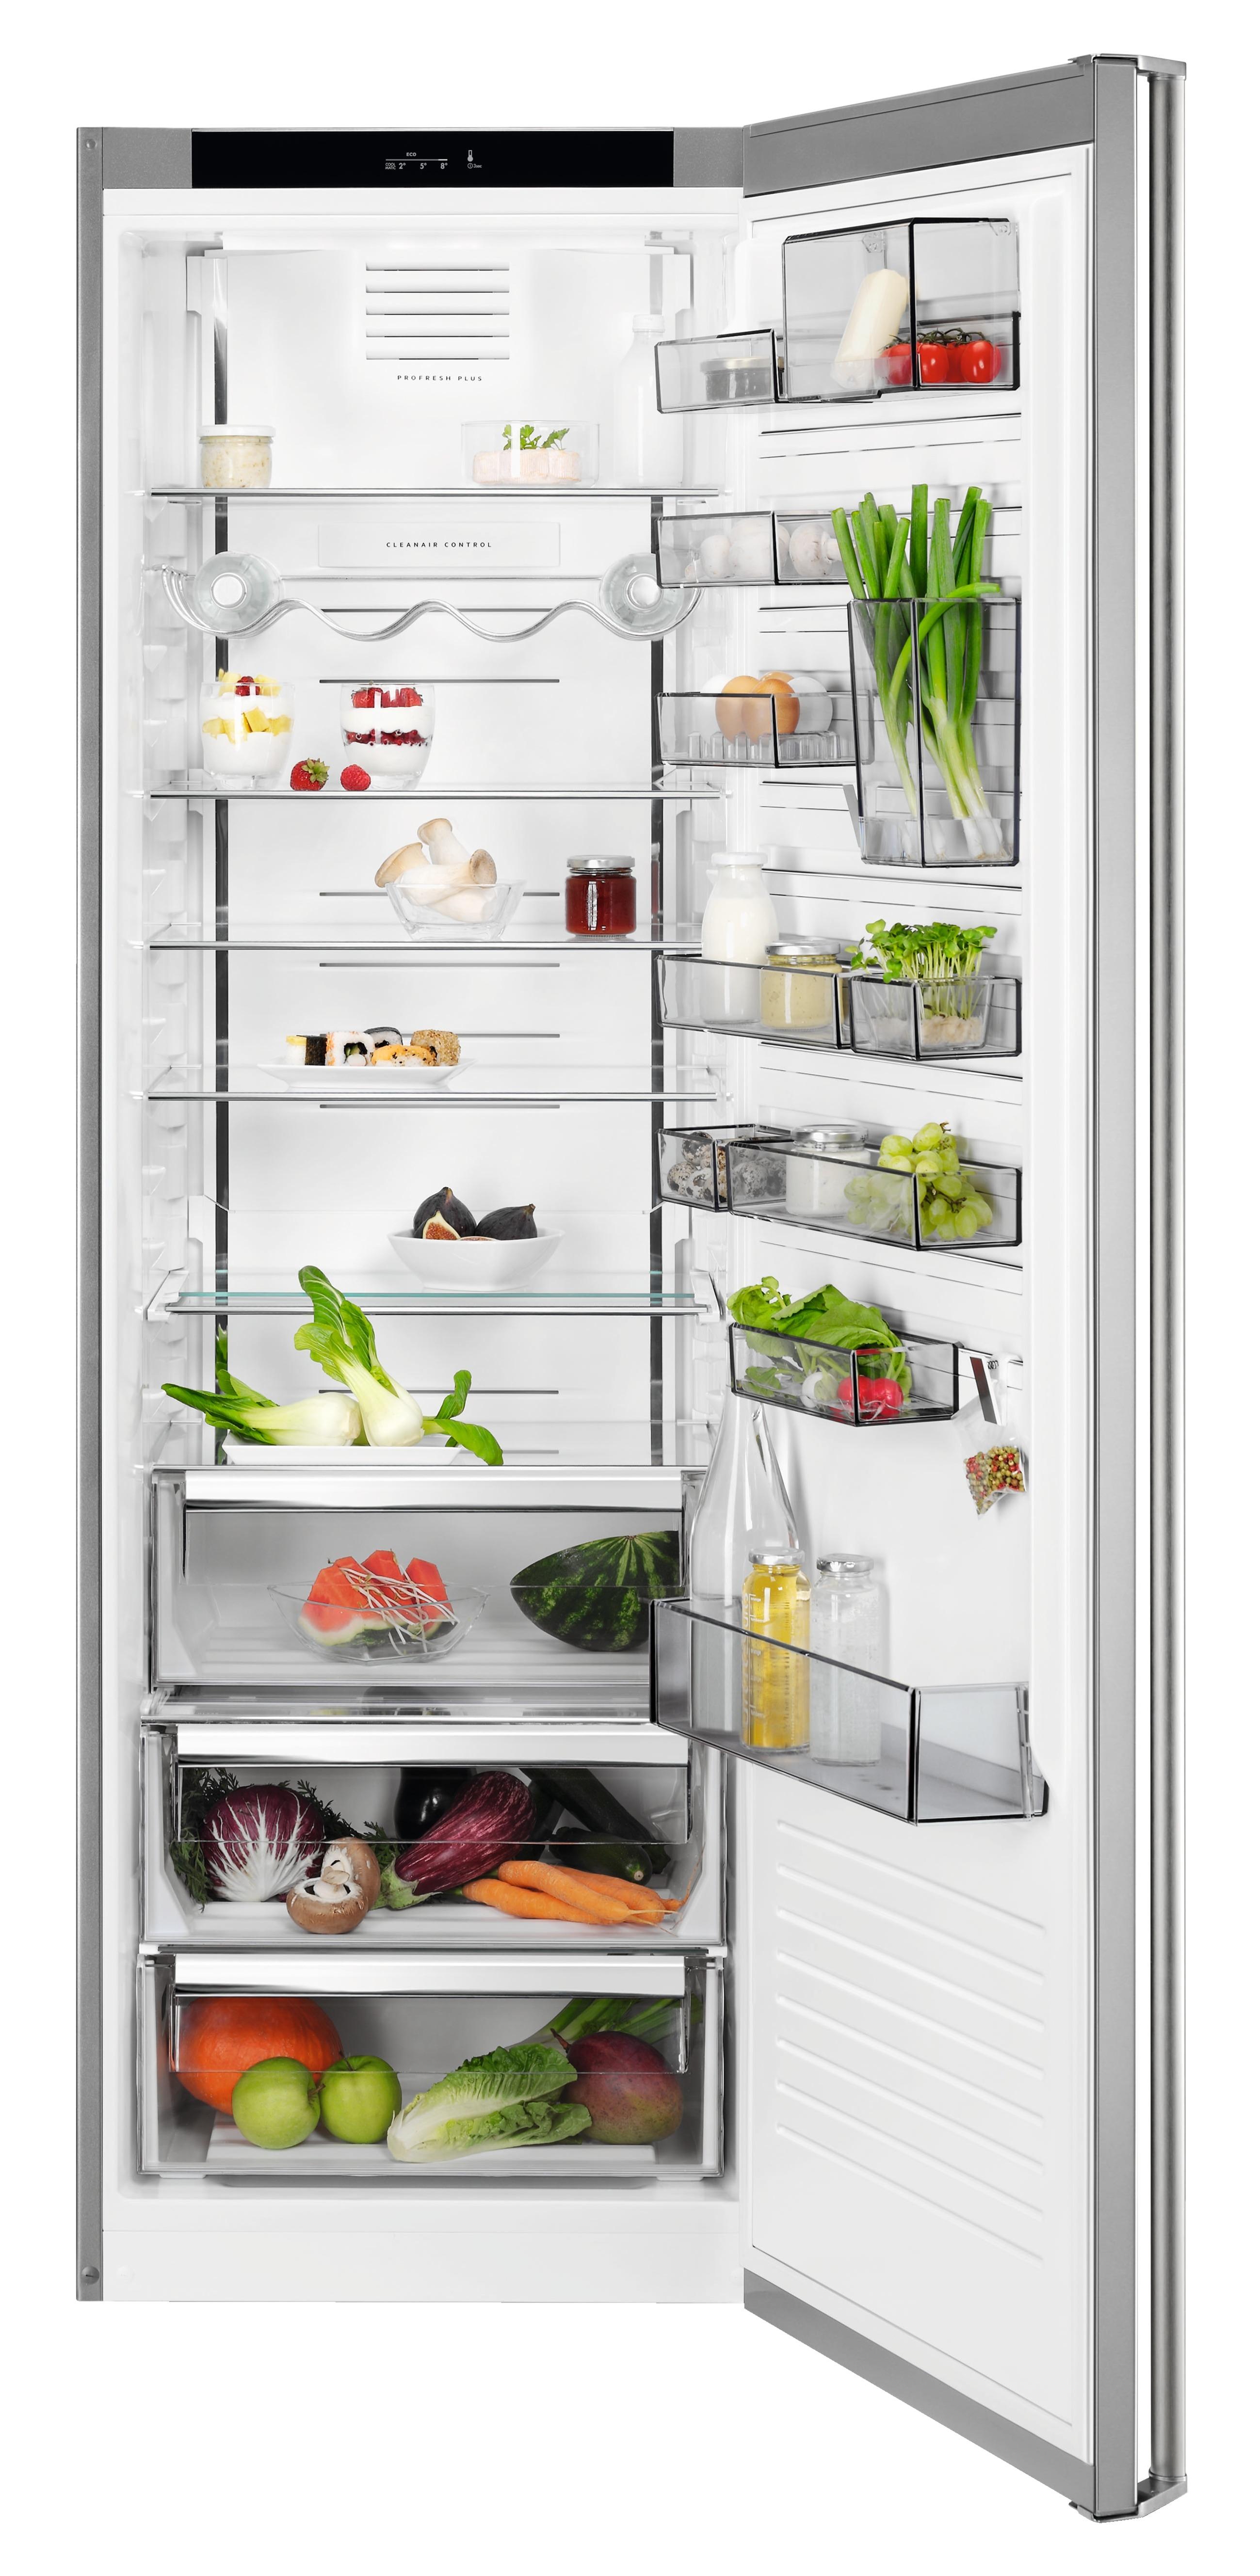 AEG koelkast zonder vriesvak RKE73924MX inox